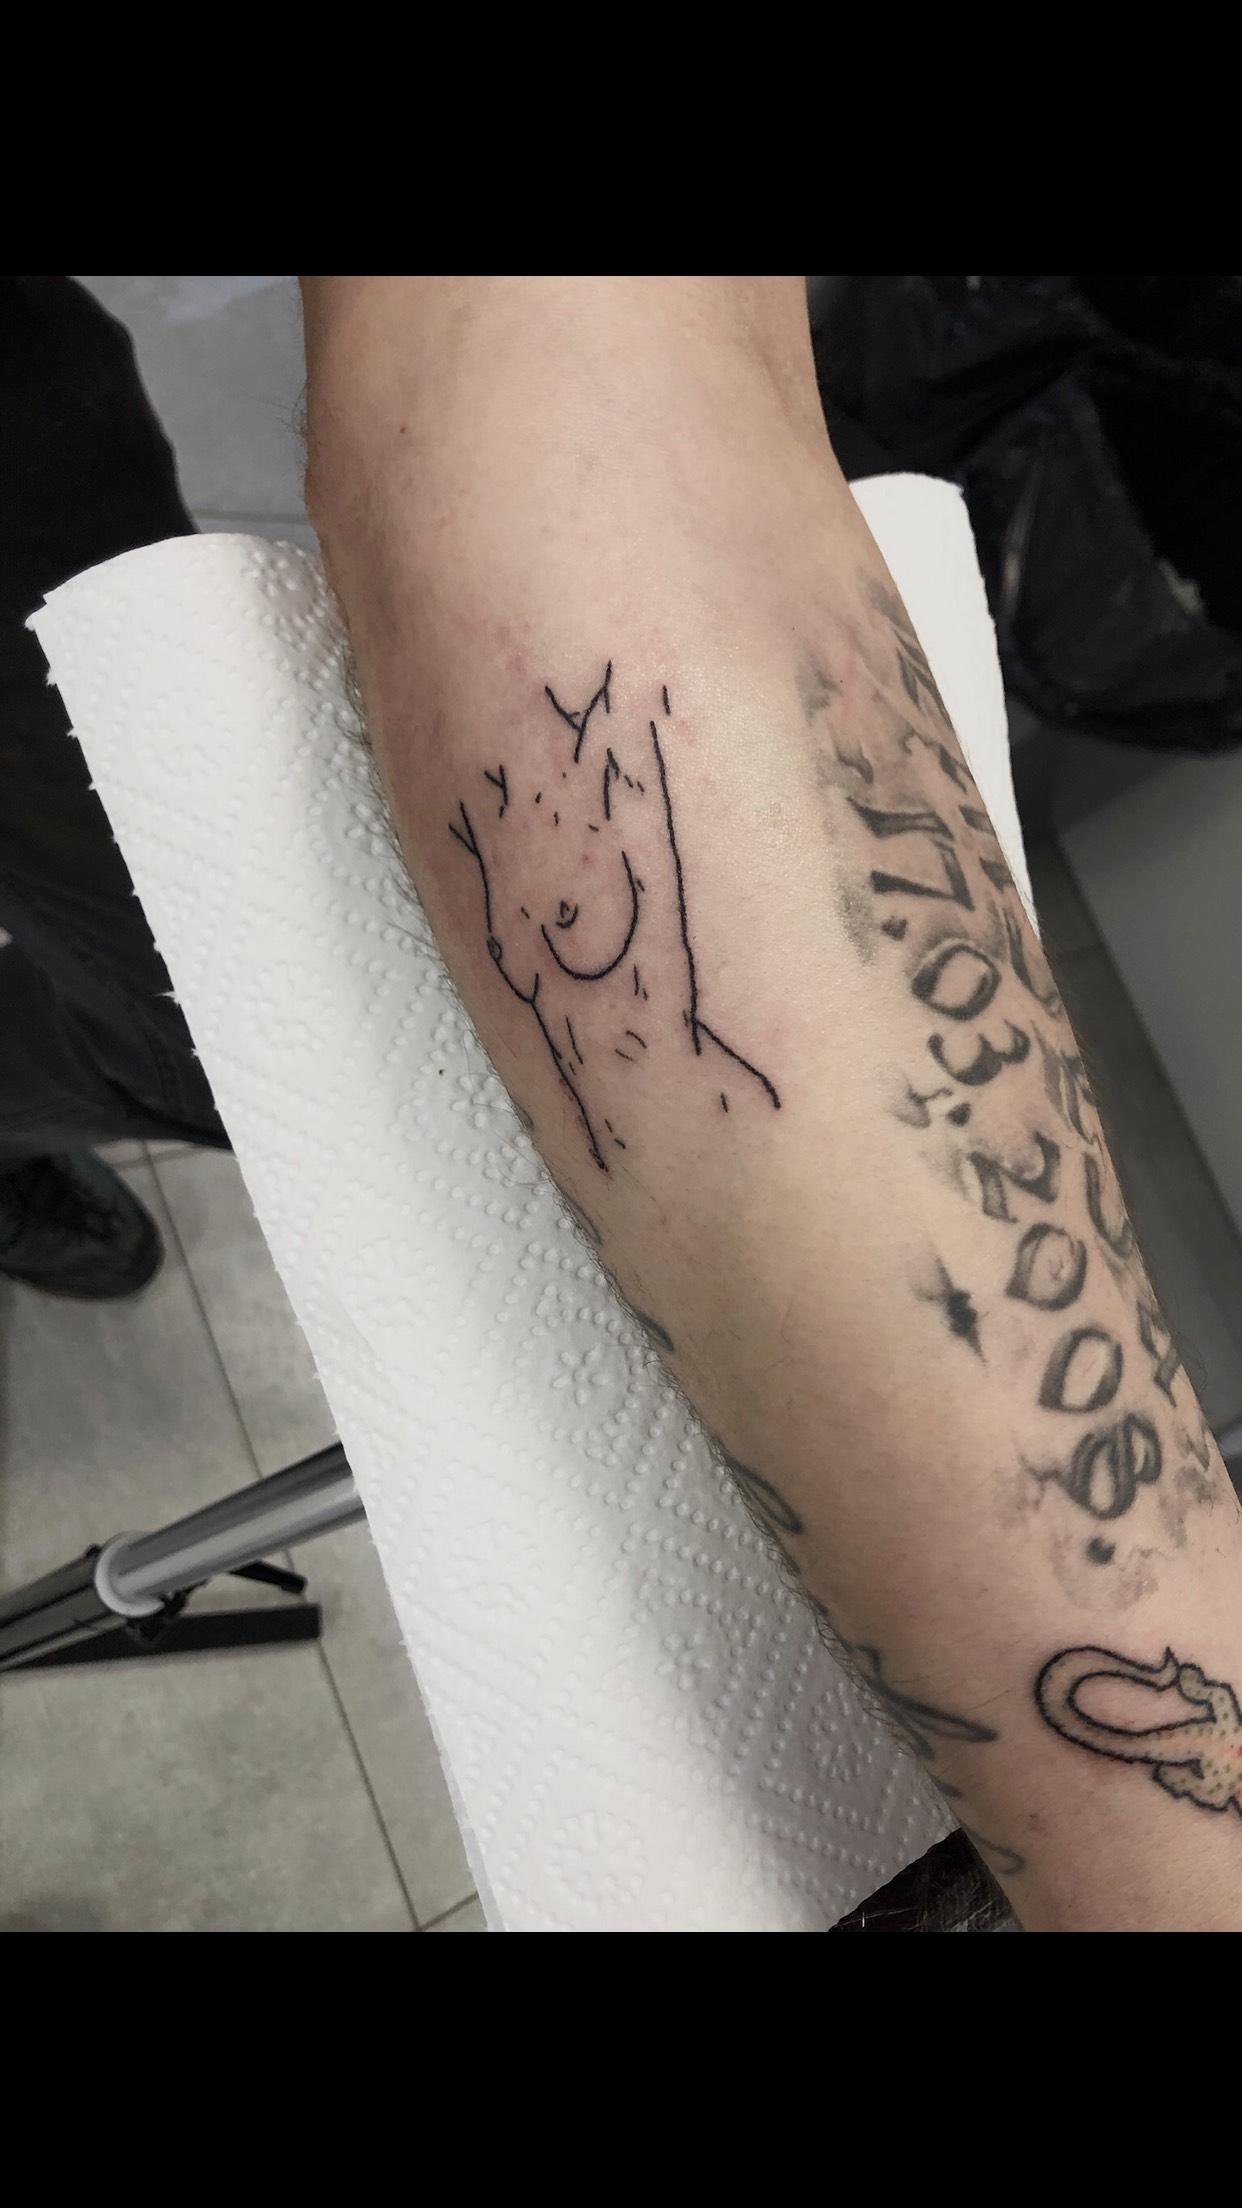 Inksearch tattoo Paulina Liliana